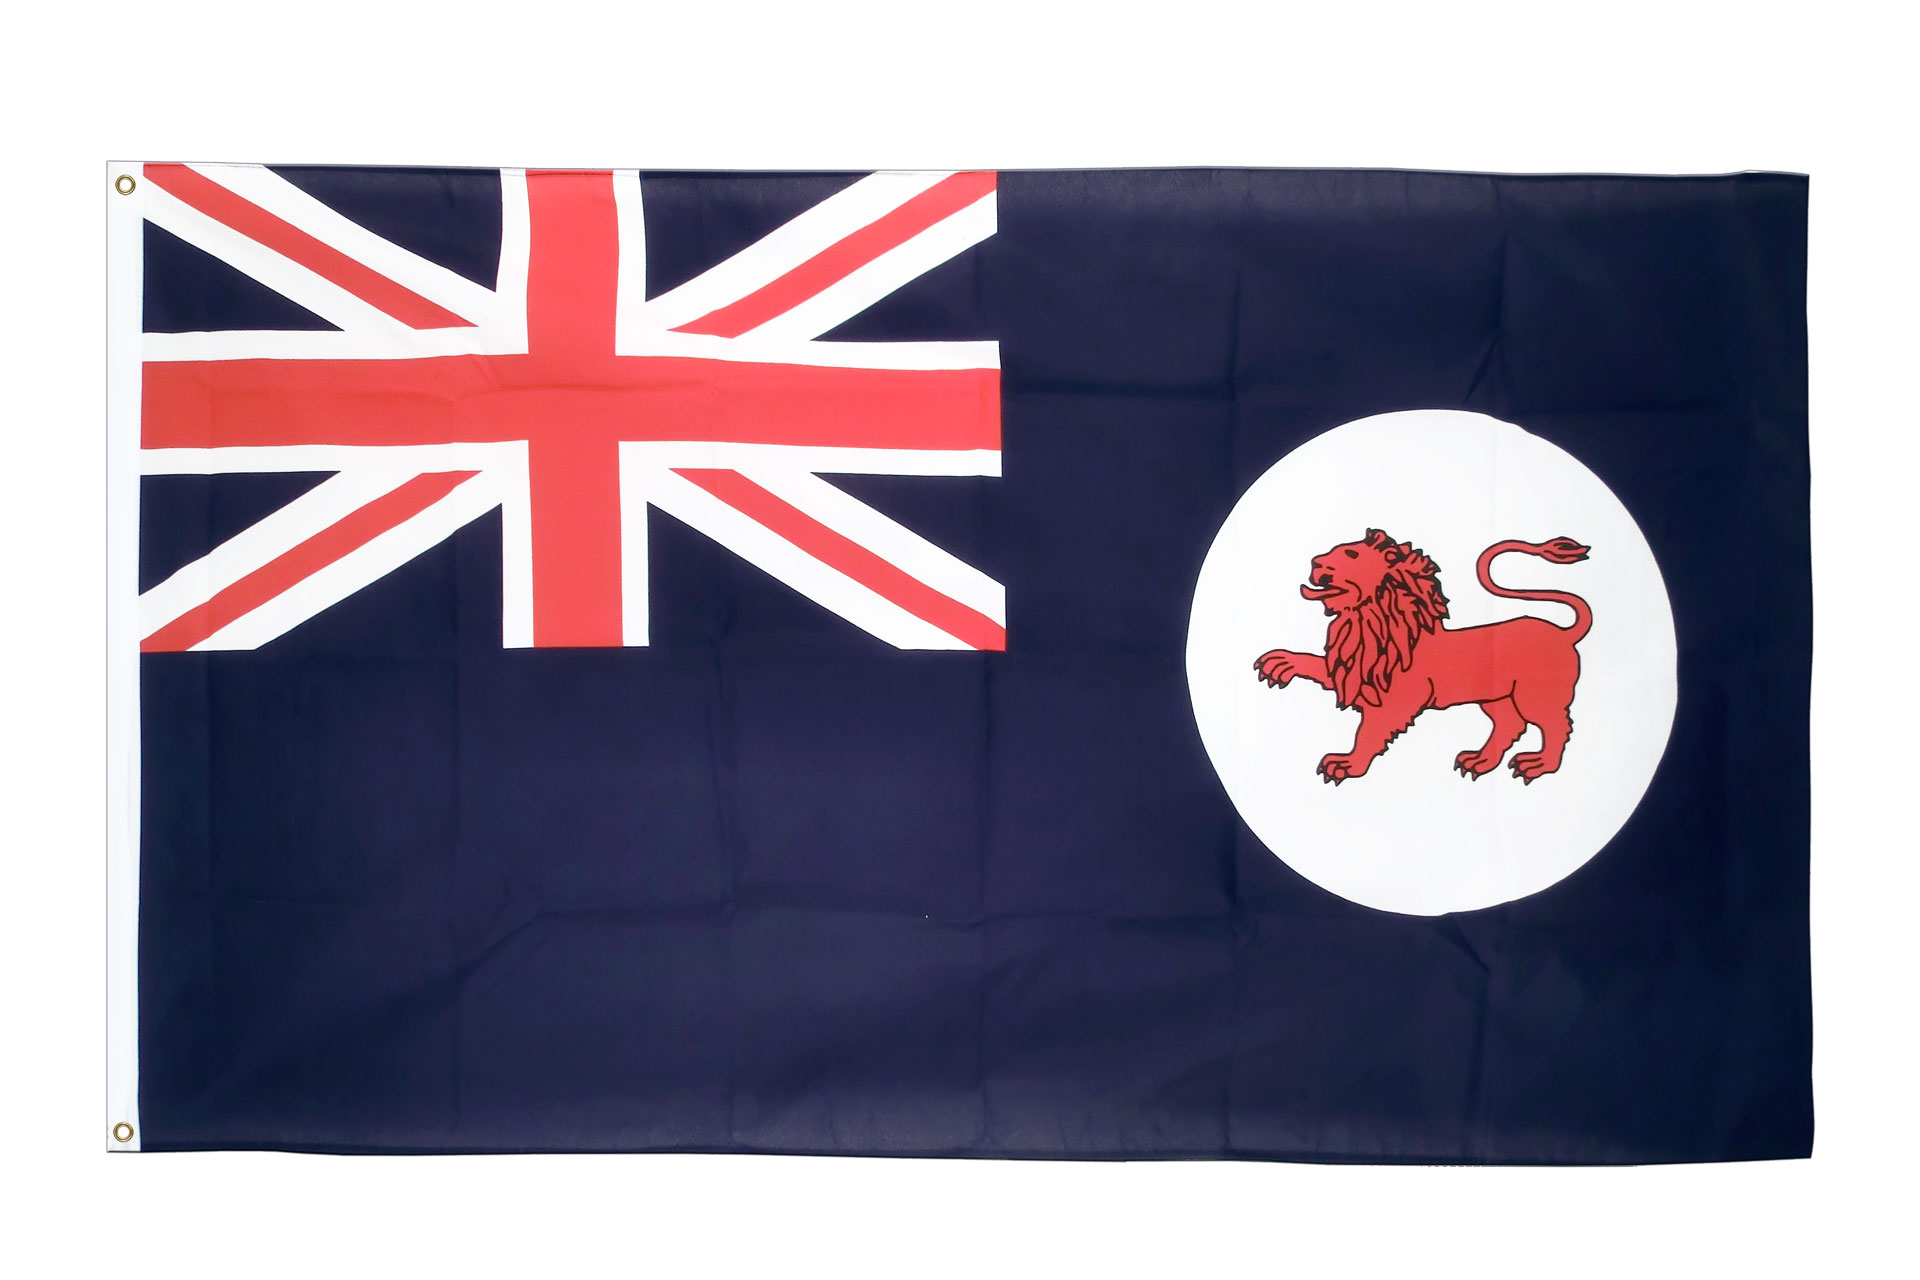 Buy Tasmania Flag - 3x5 ft (90x150 cm) - Royal-Flags: royal-flags.co.uk/australia-tasmania-flag-1550.html